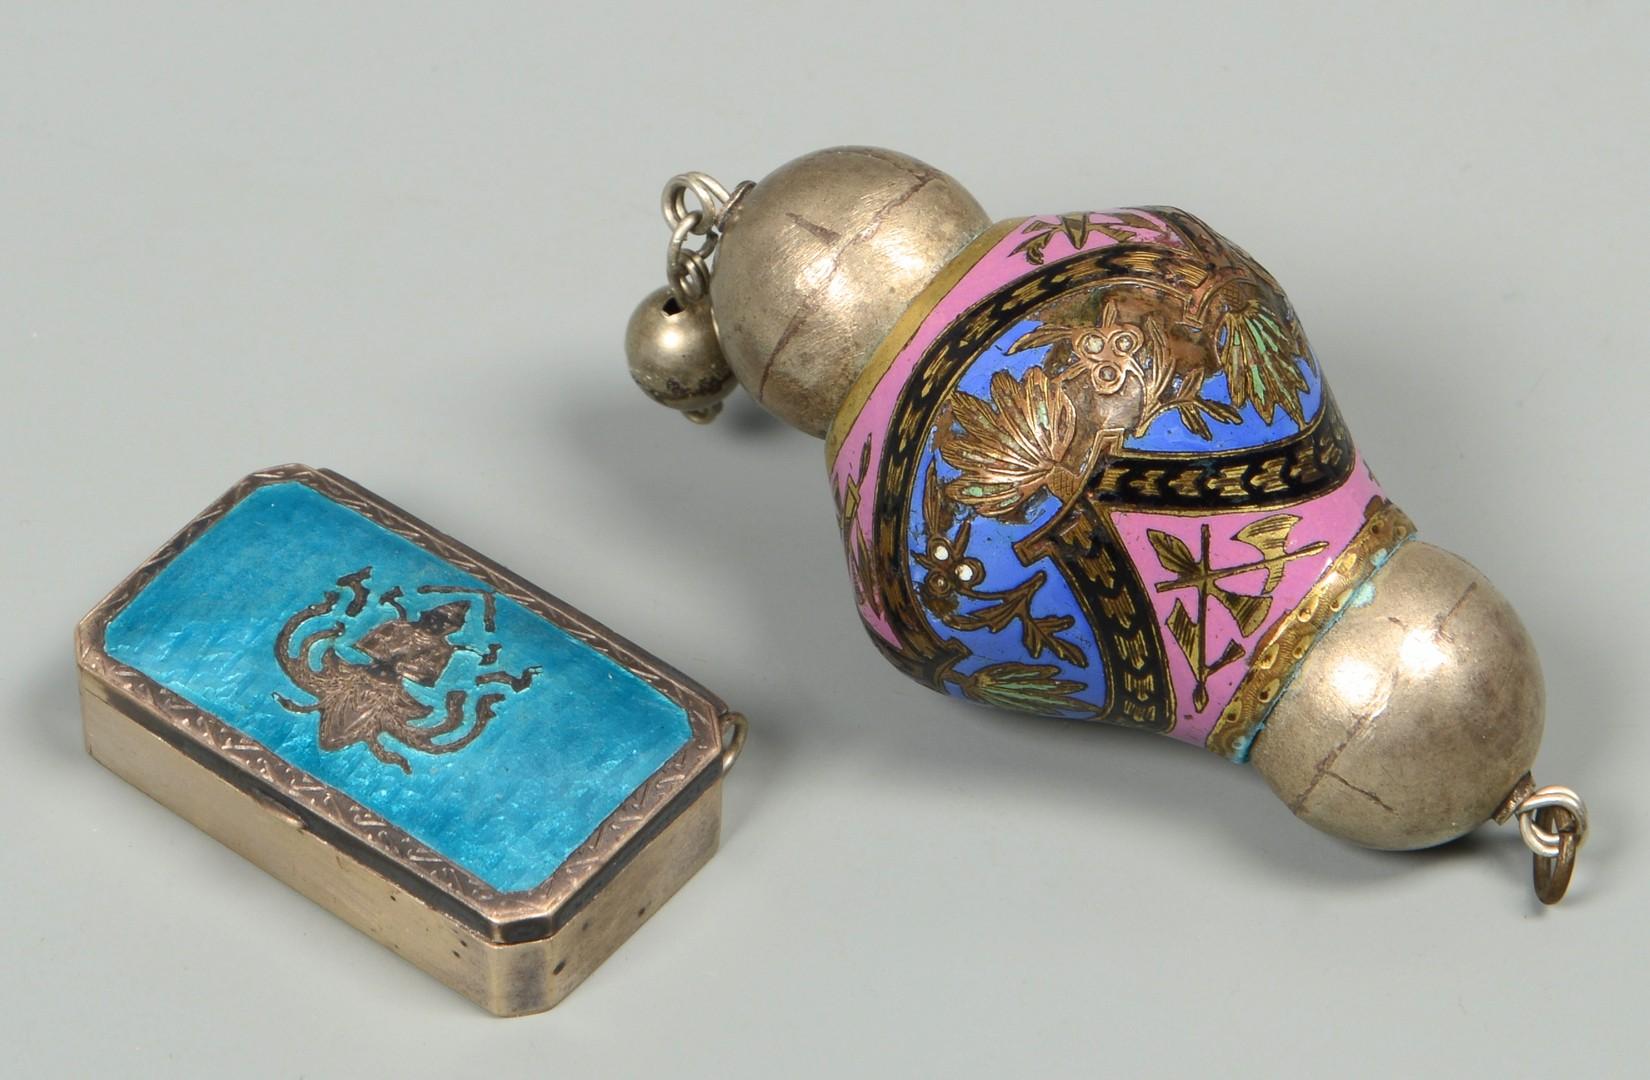 Lot 830: 6 pcs, 4 Enameled & 2 Egyptian items